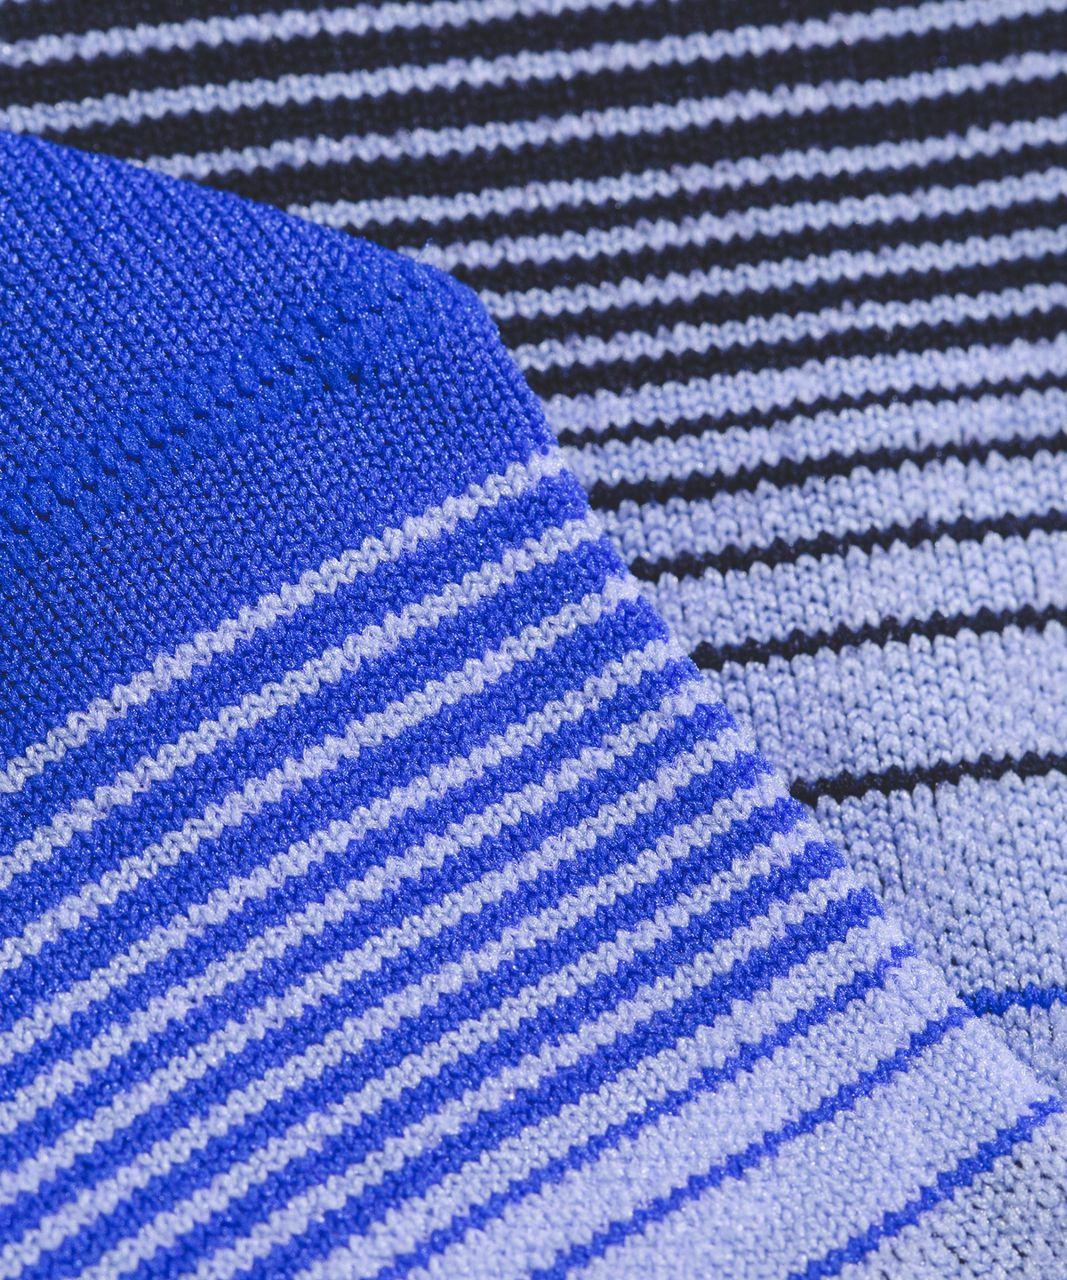 Lululemon Play All Day Sock - Blazer Blue / Hydrangea Blue / Midnight Navy